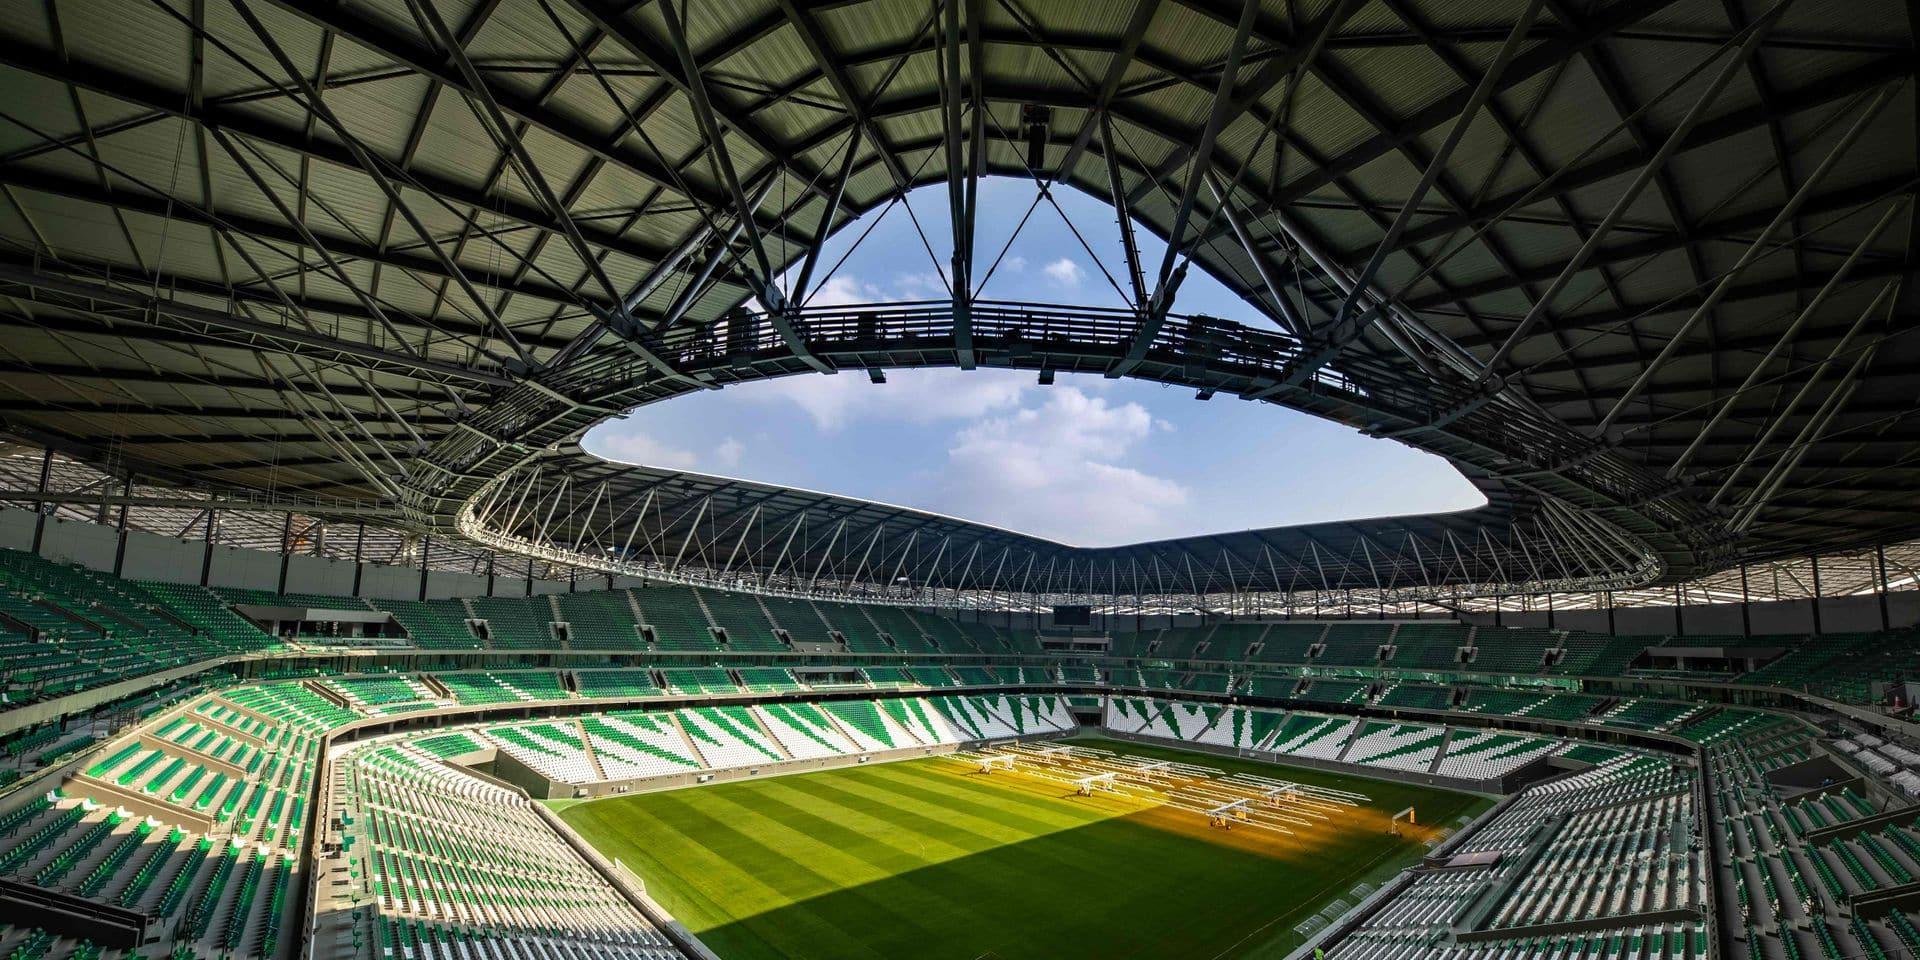 Le Qatar inaugurera un stade du Mondial-2022 avec des fans guéris du Covid-19